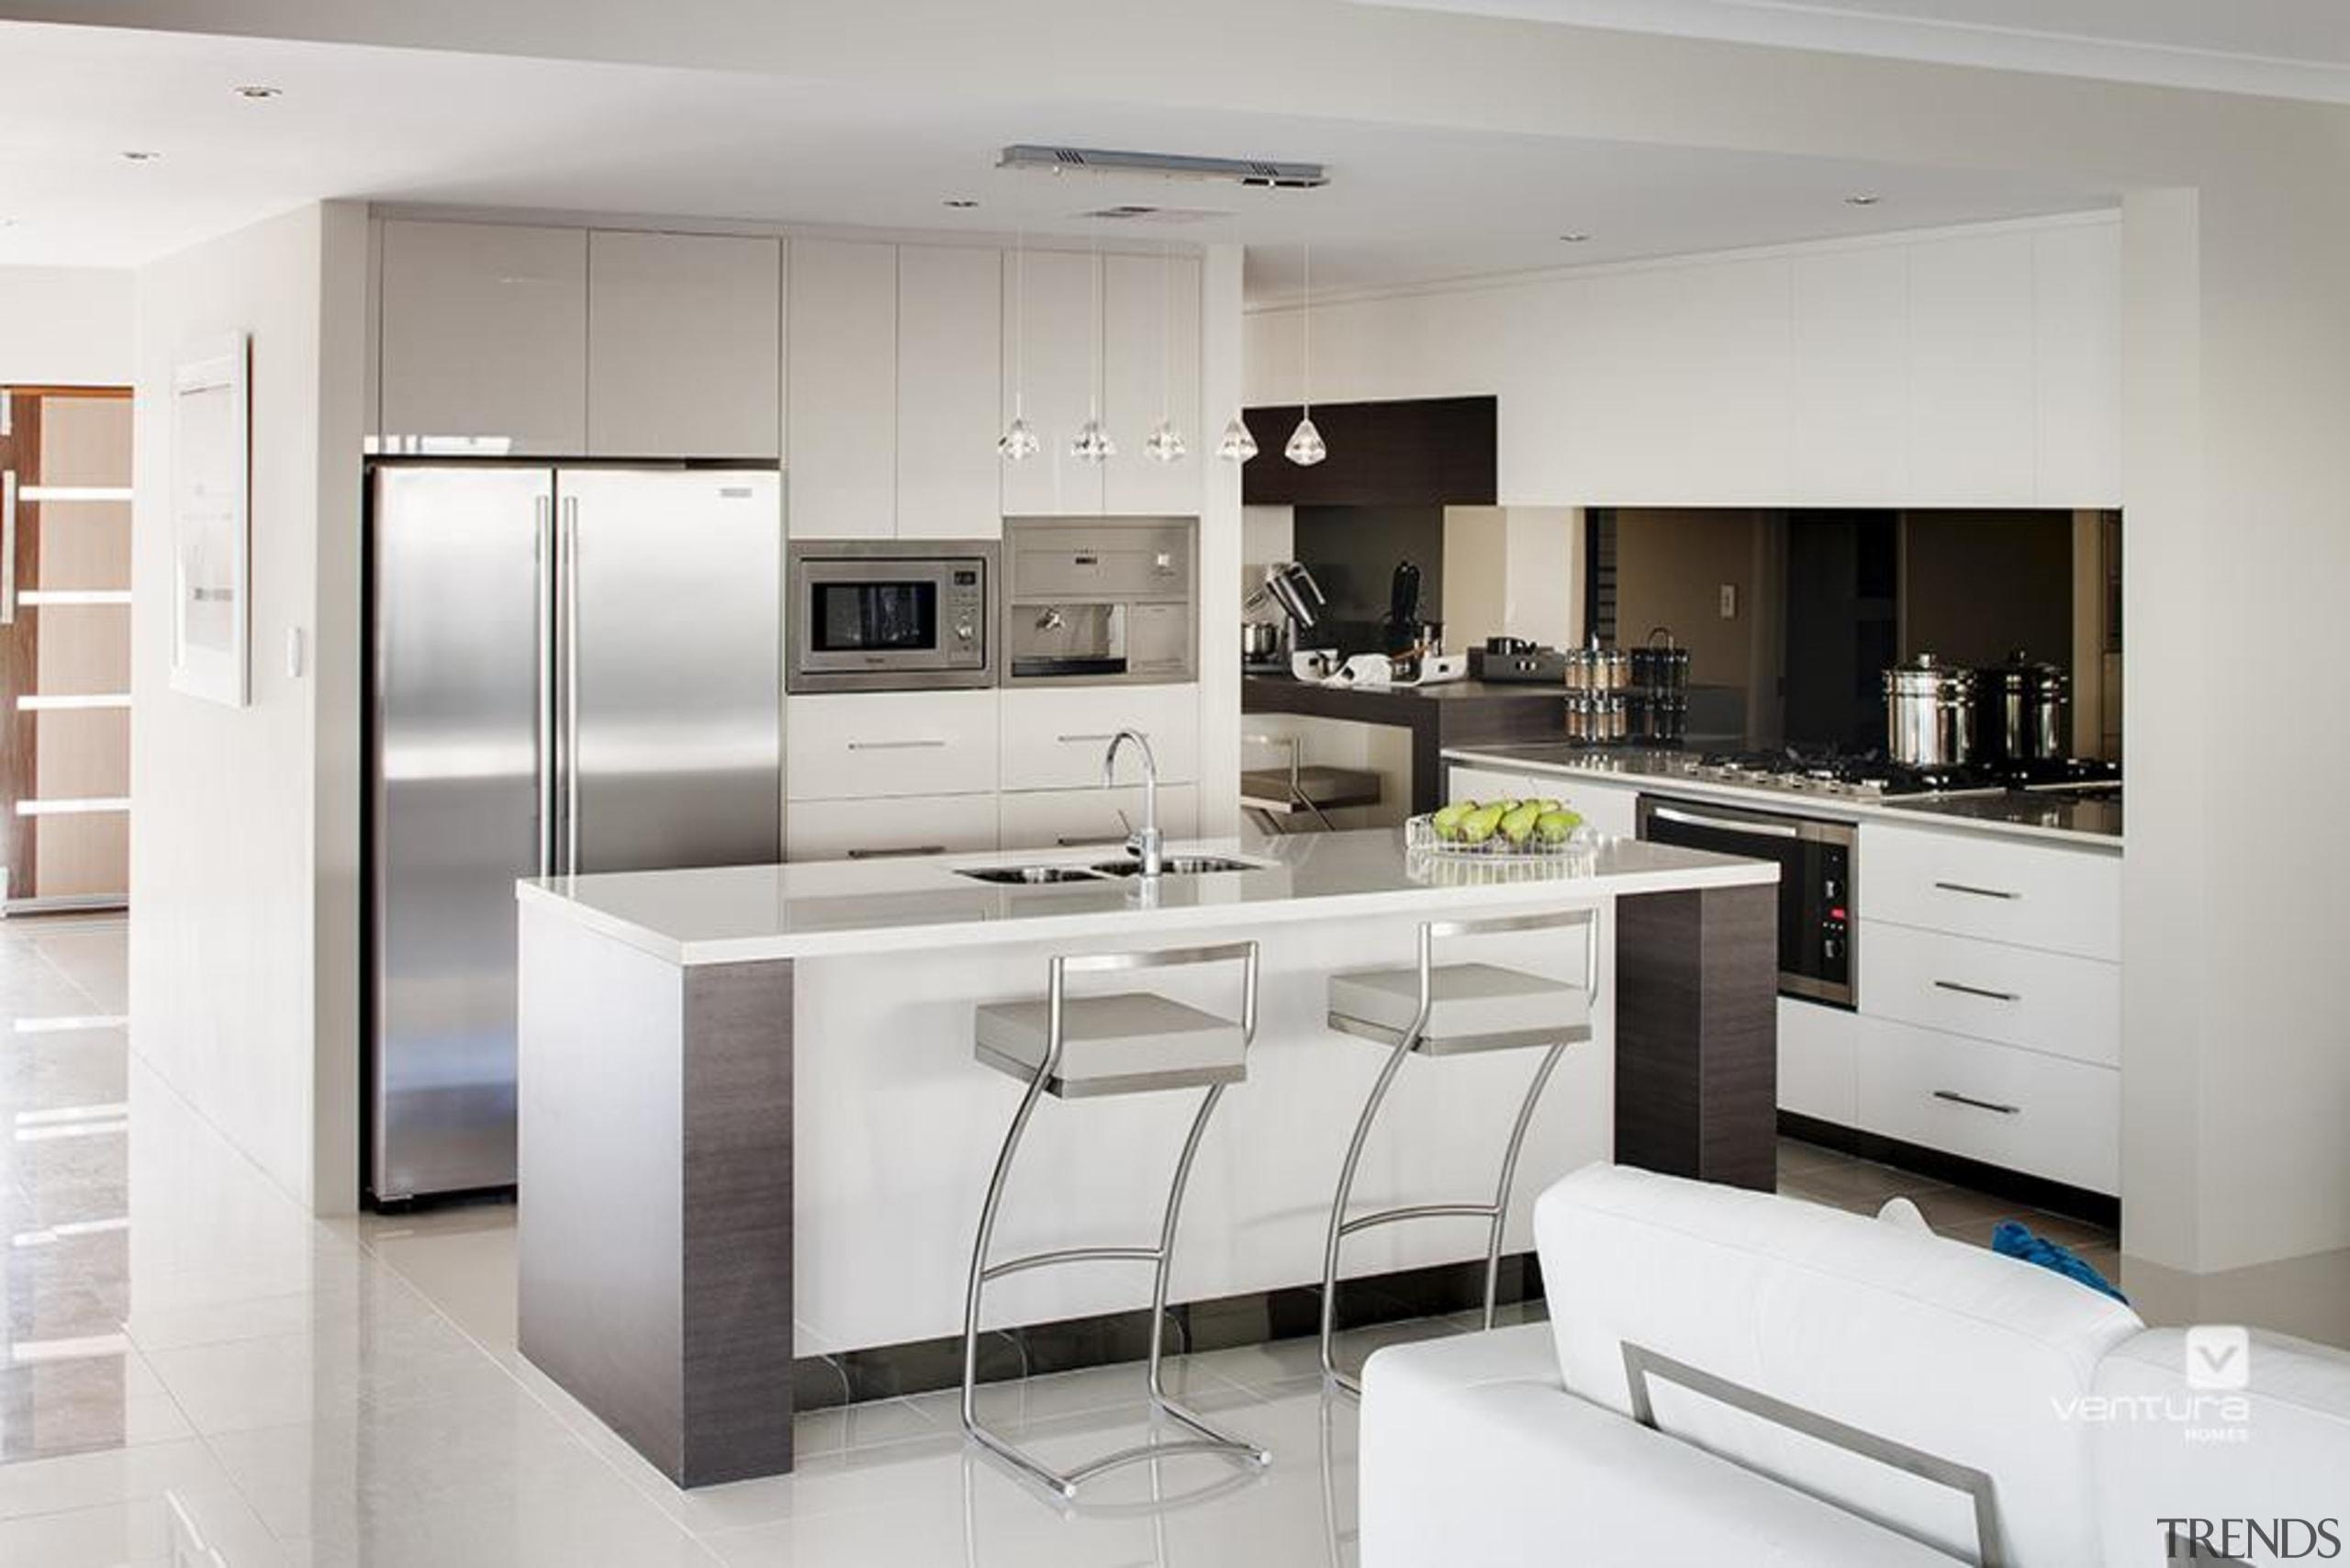 Kitchen design. - The New Dimension Display Home cabinetry, countertop, cuisine classique, home appliance, interior design, interior designer, kitchen, product design, gray